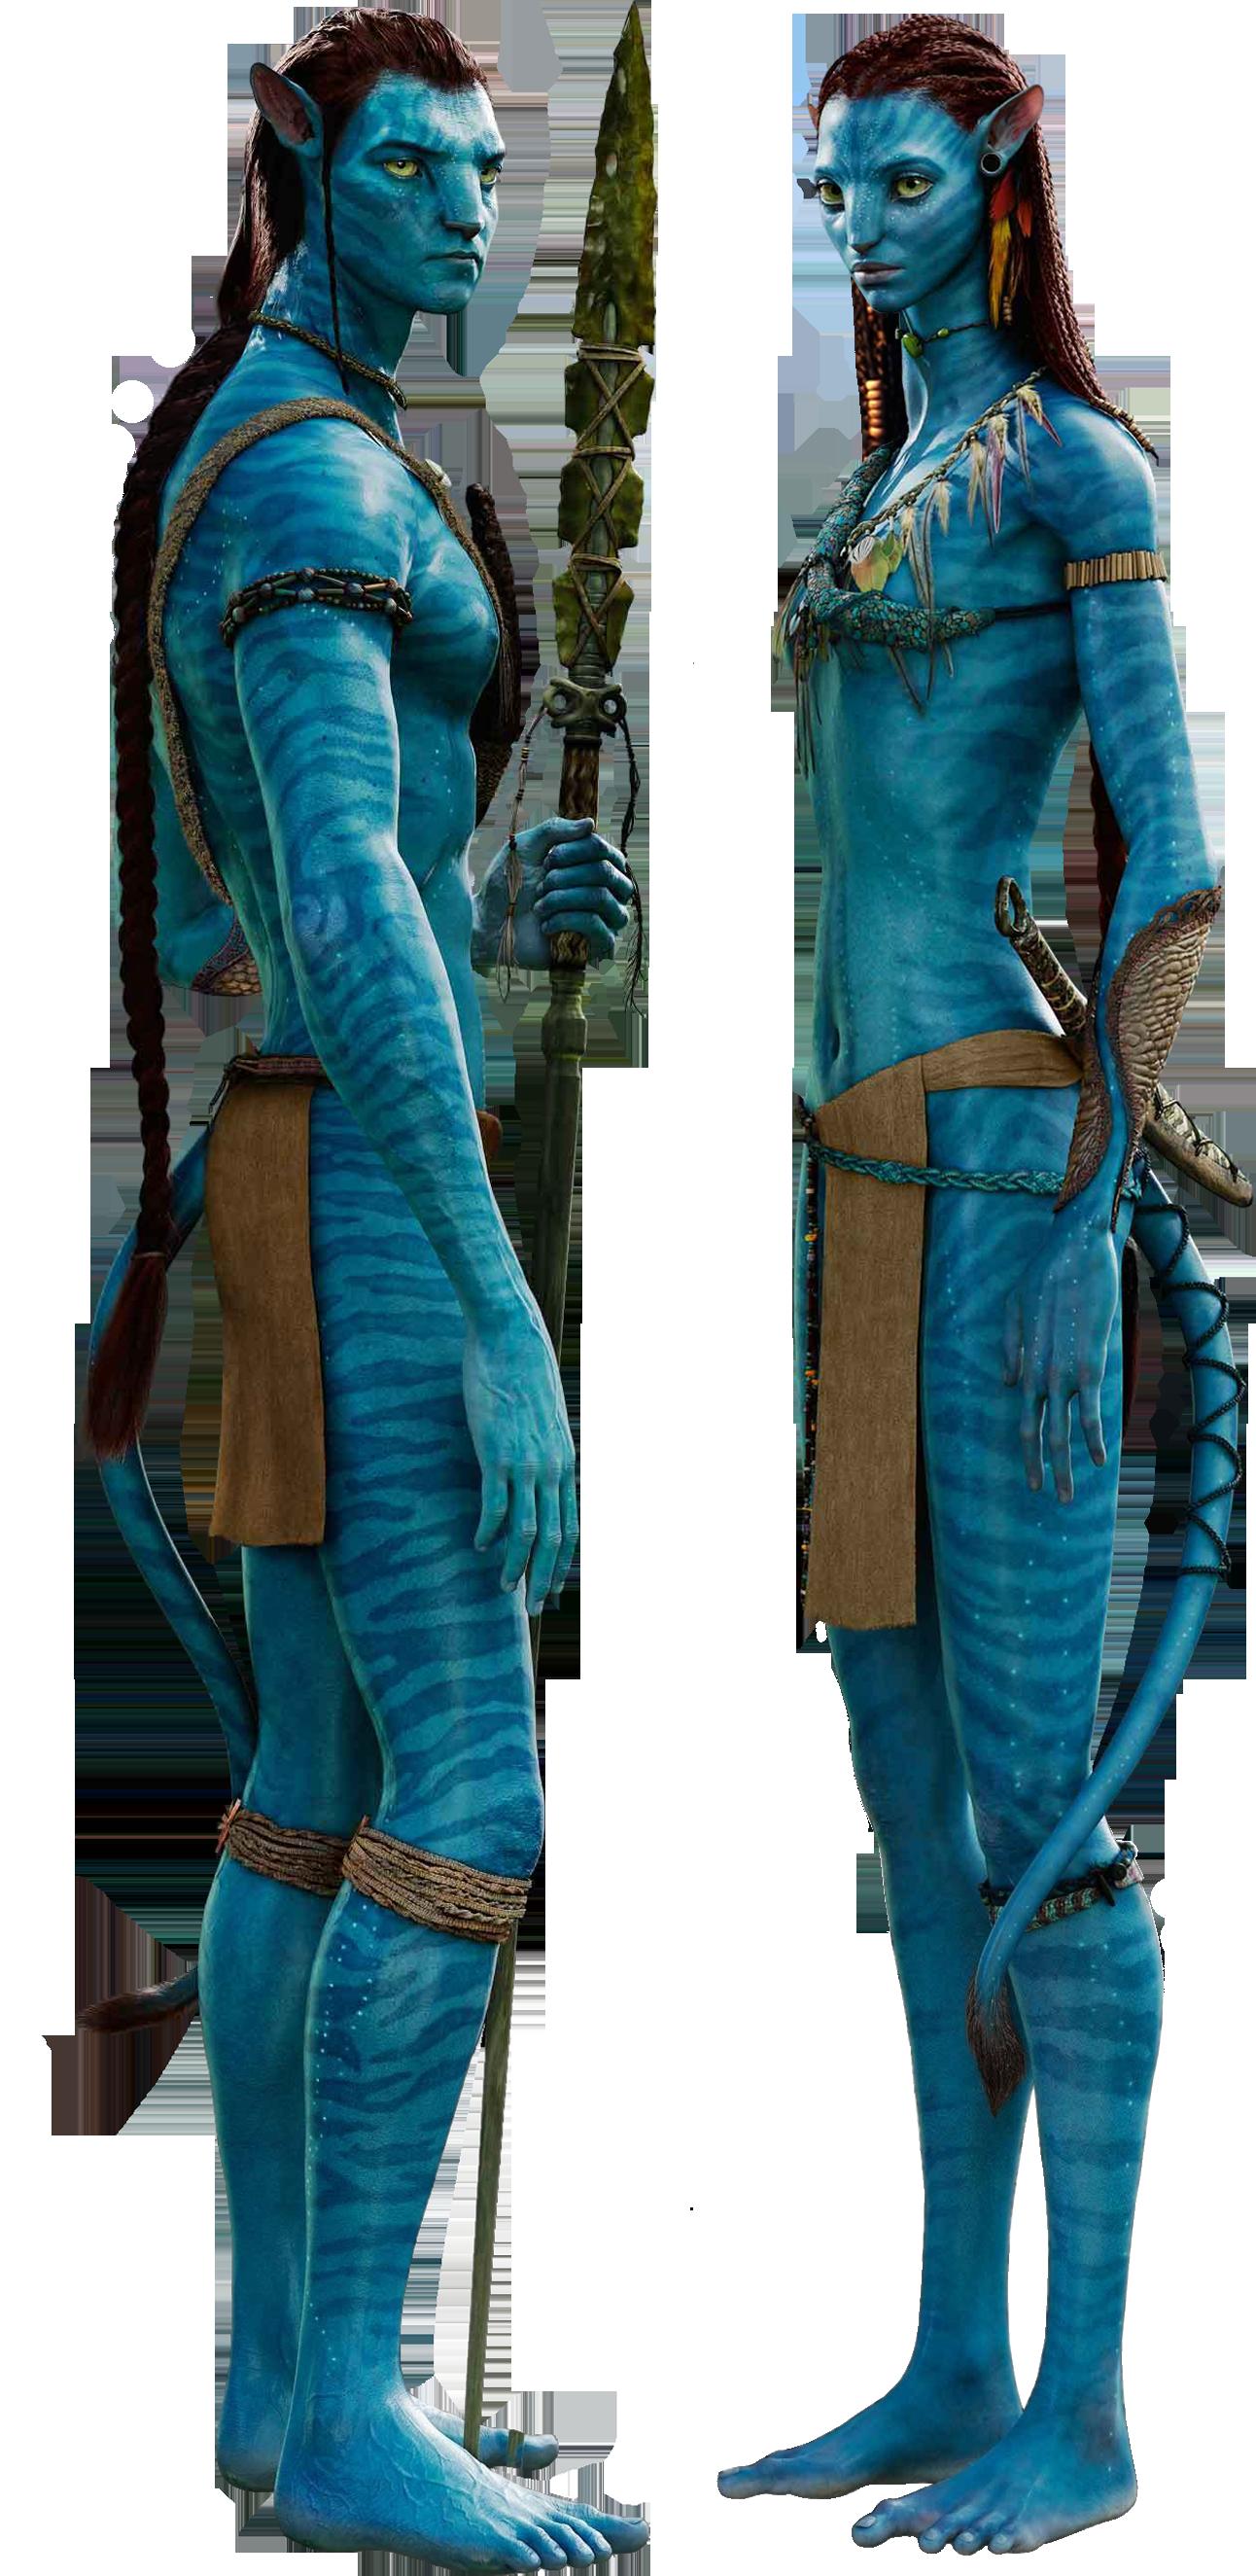 Avatar Movie PNG Transparent Images, Pictures, Photos.